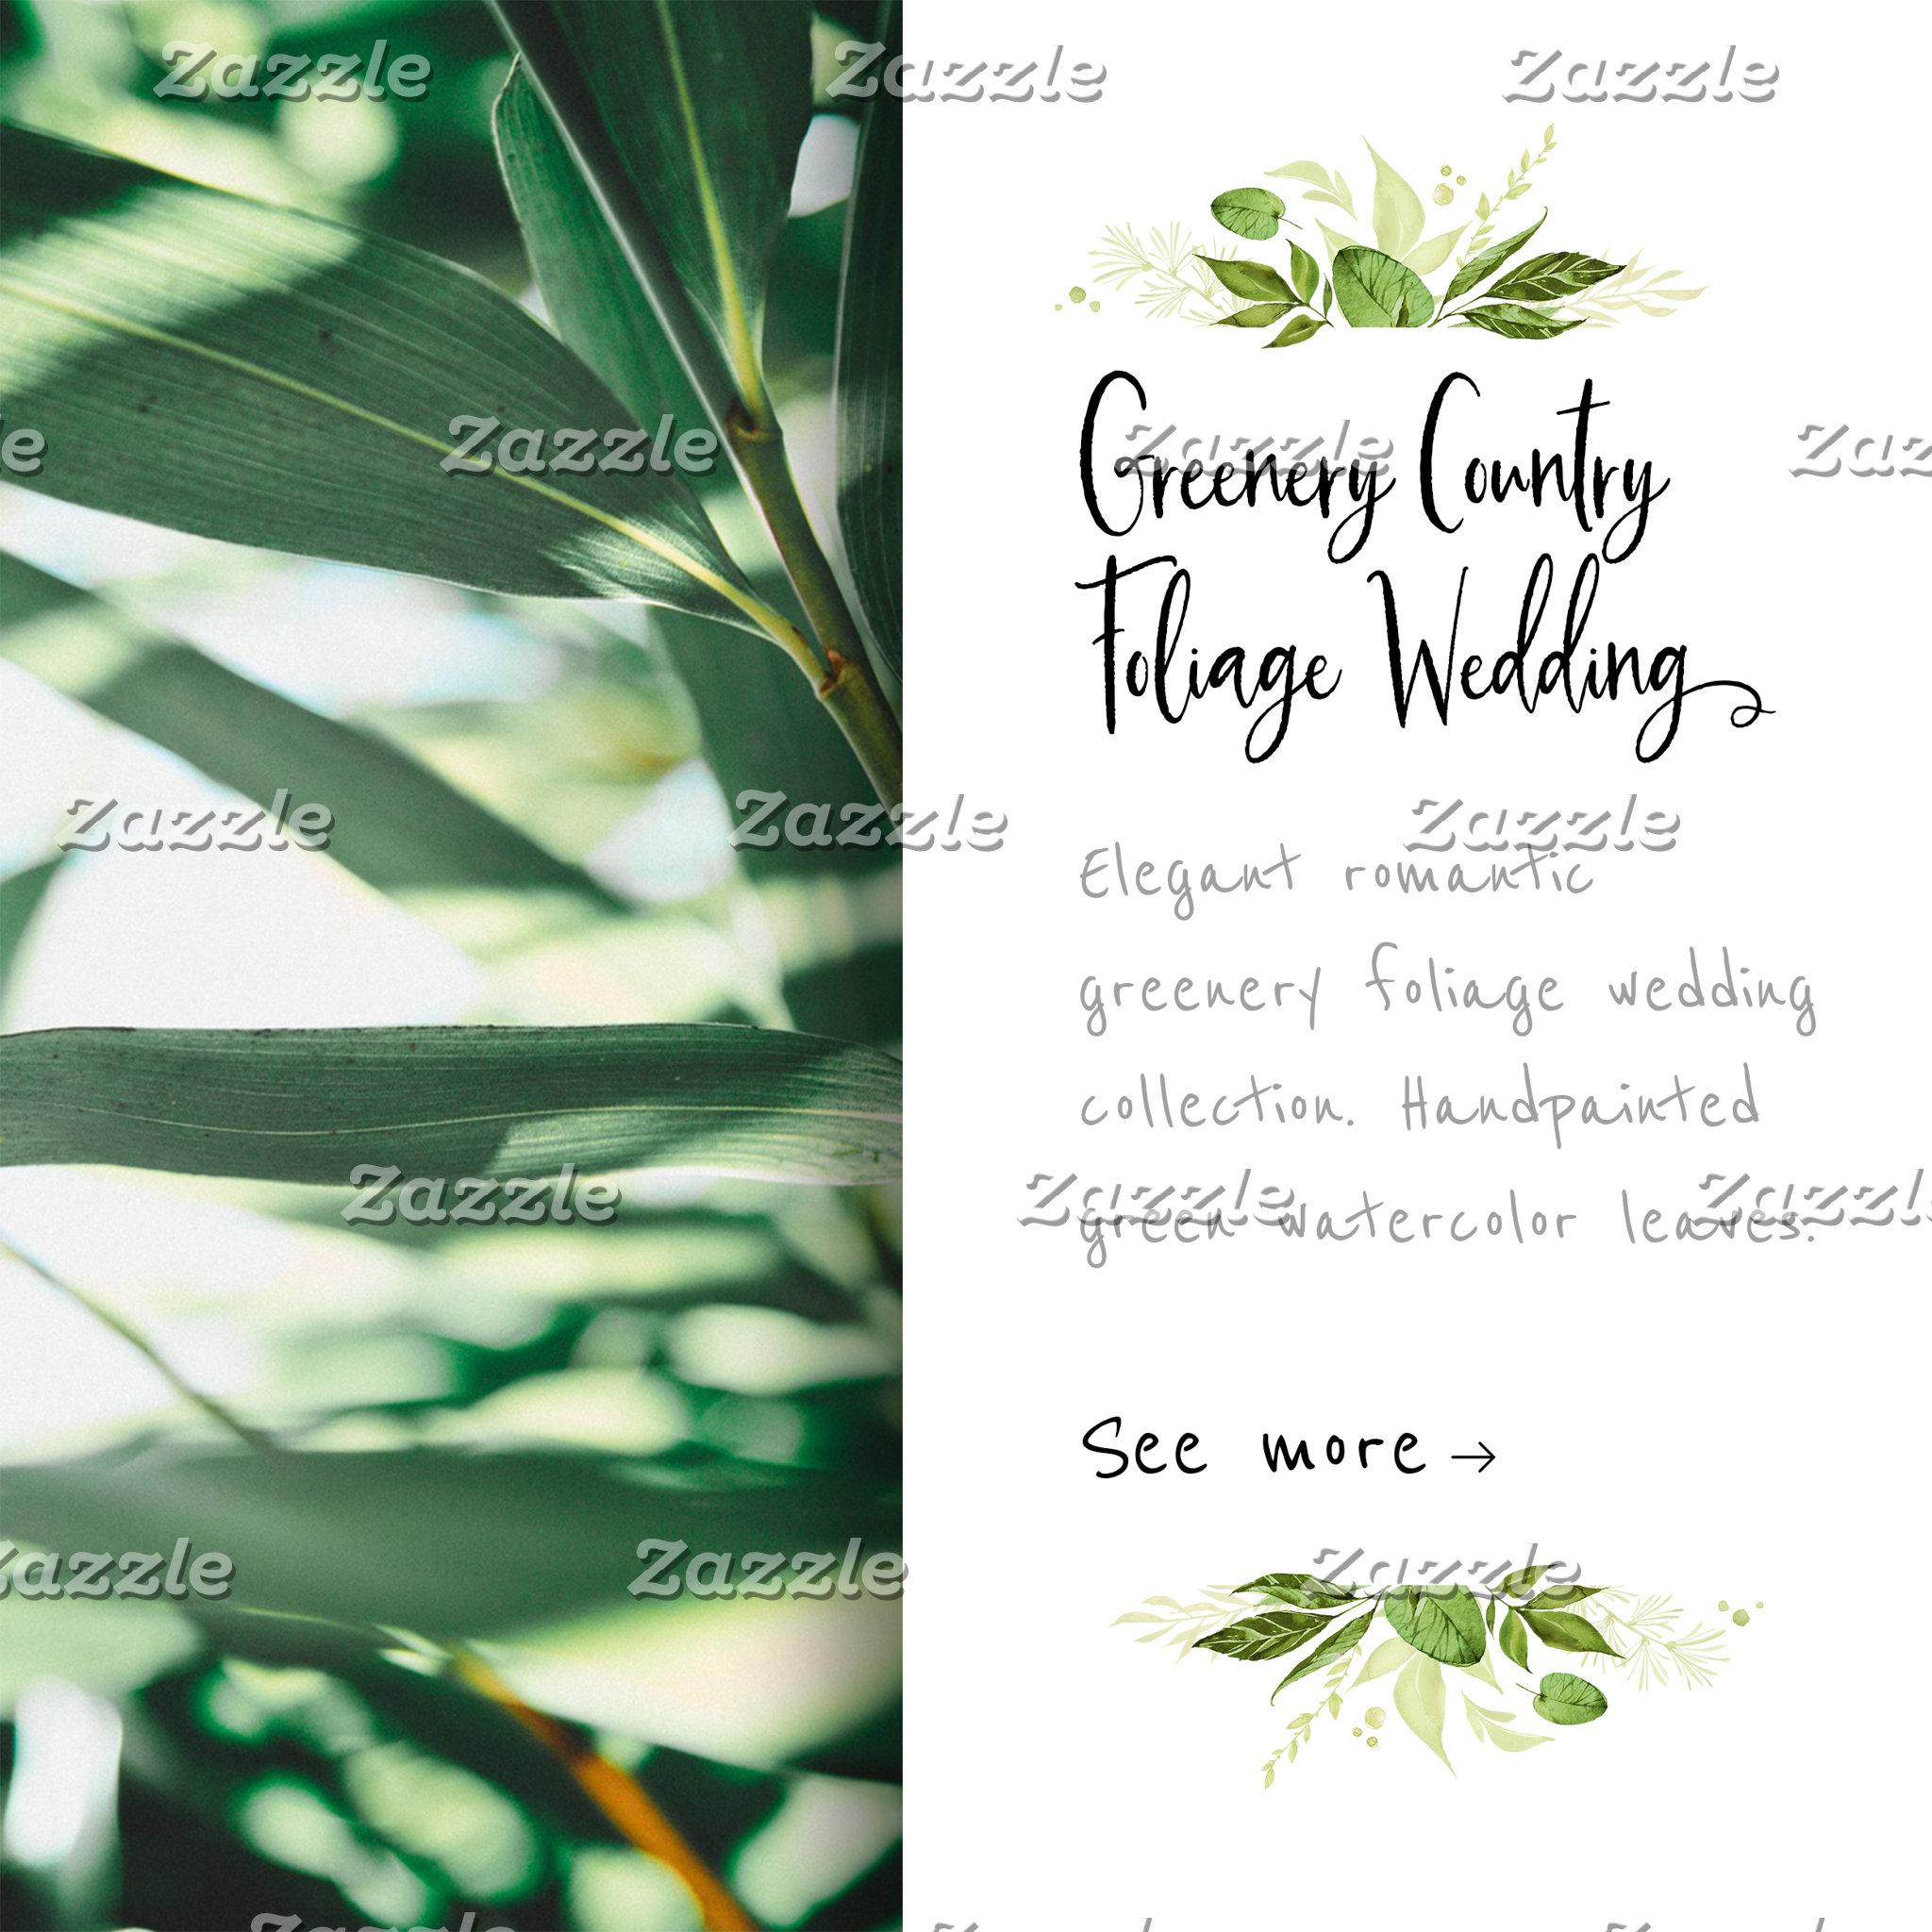 Greenery Country Foliage Wedding